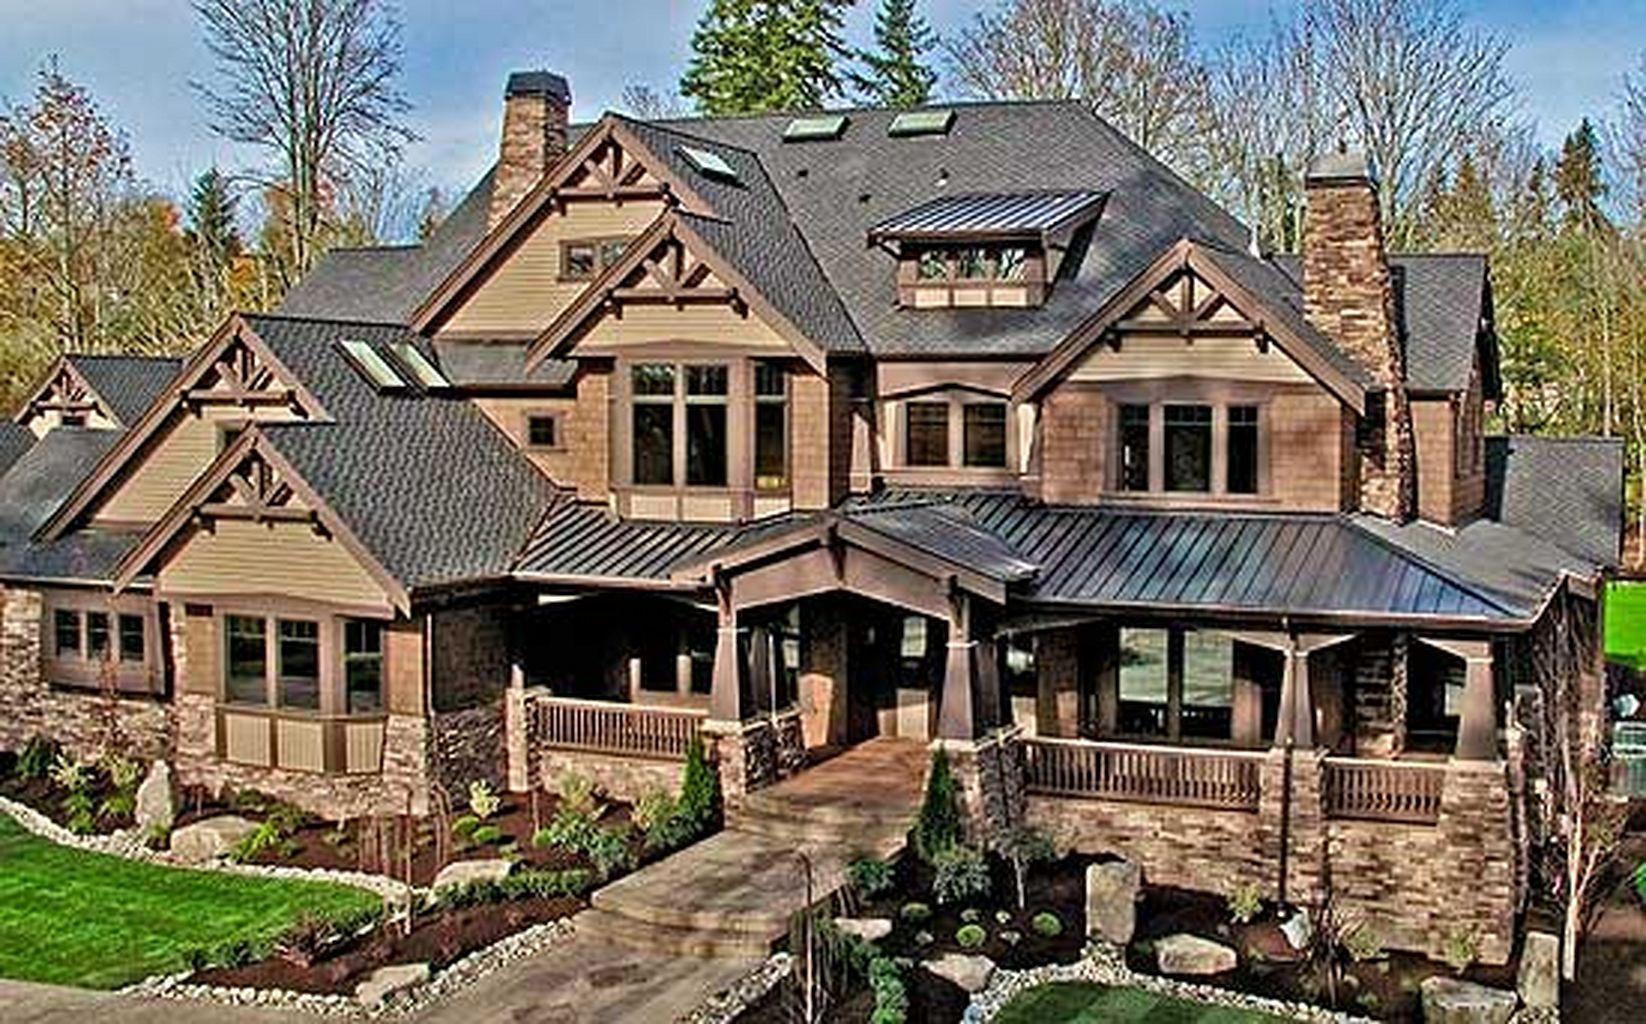 Best Craftsman Style Homes Plans Photo Galleries #craftsmanstylehomes